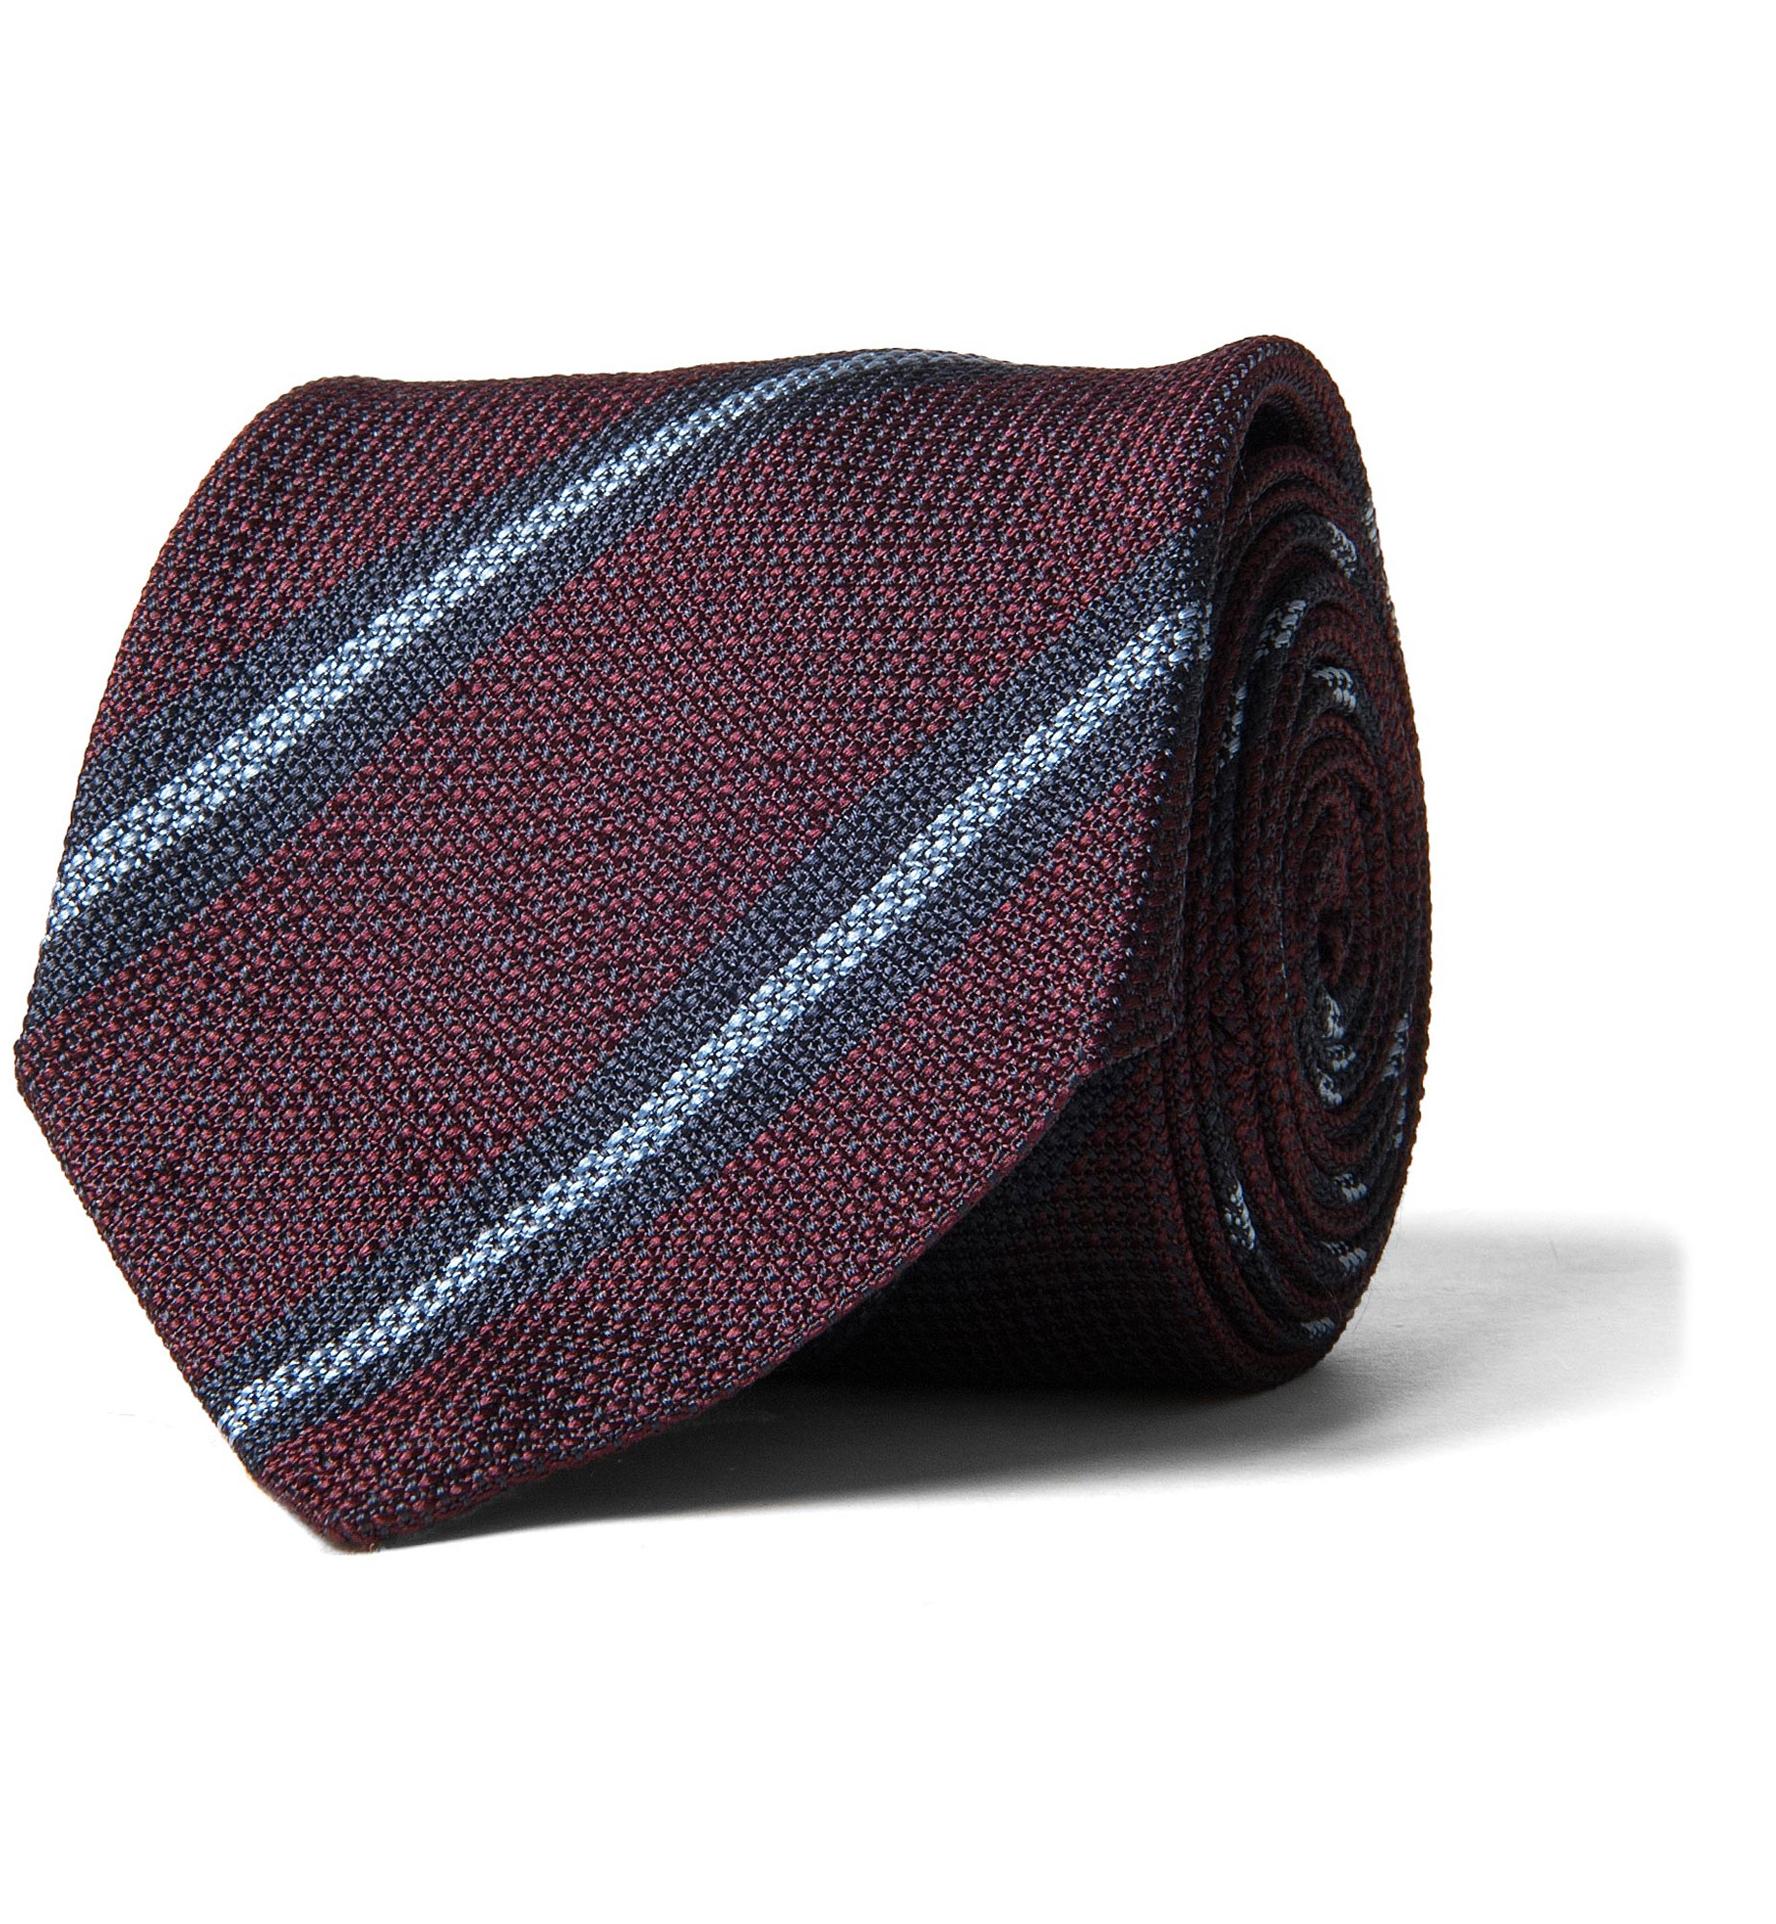 Zoom Image of Burgundy and Blue Striped Silk Grenadine Tie